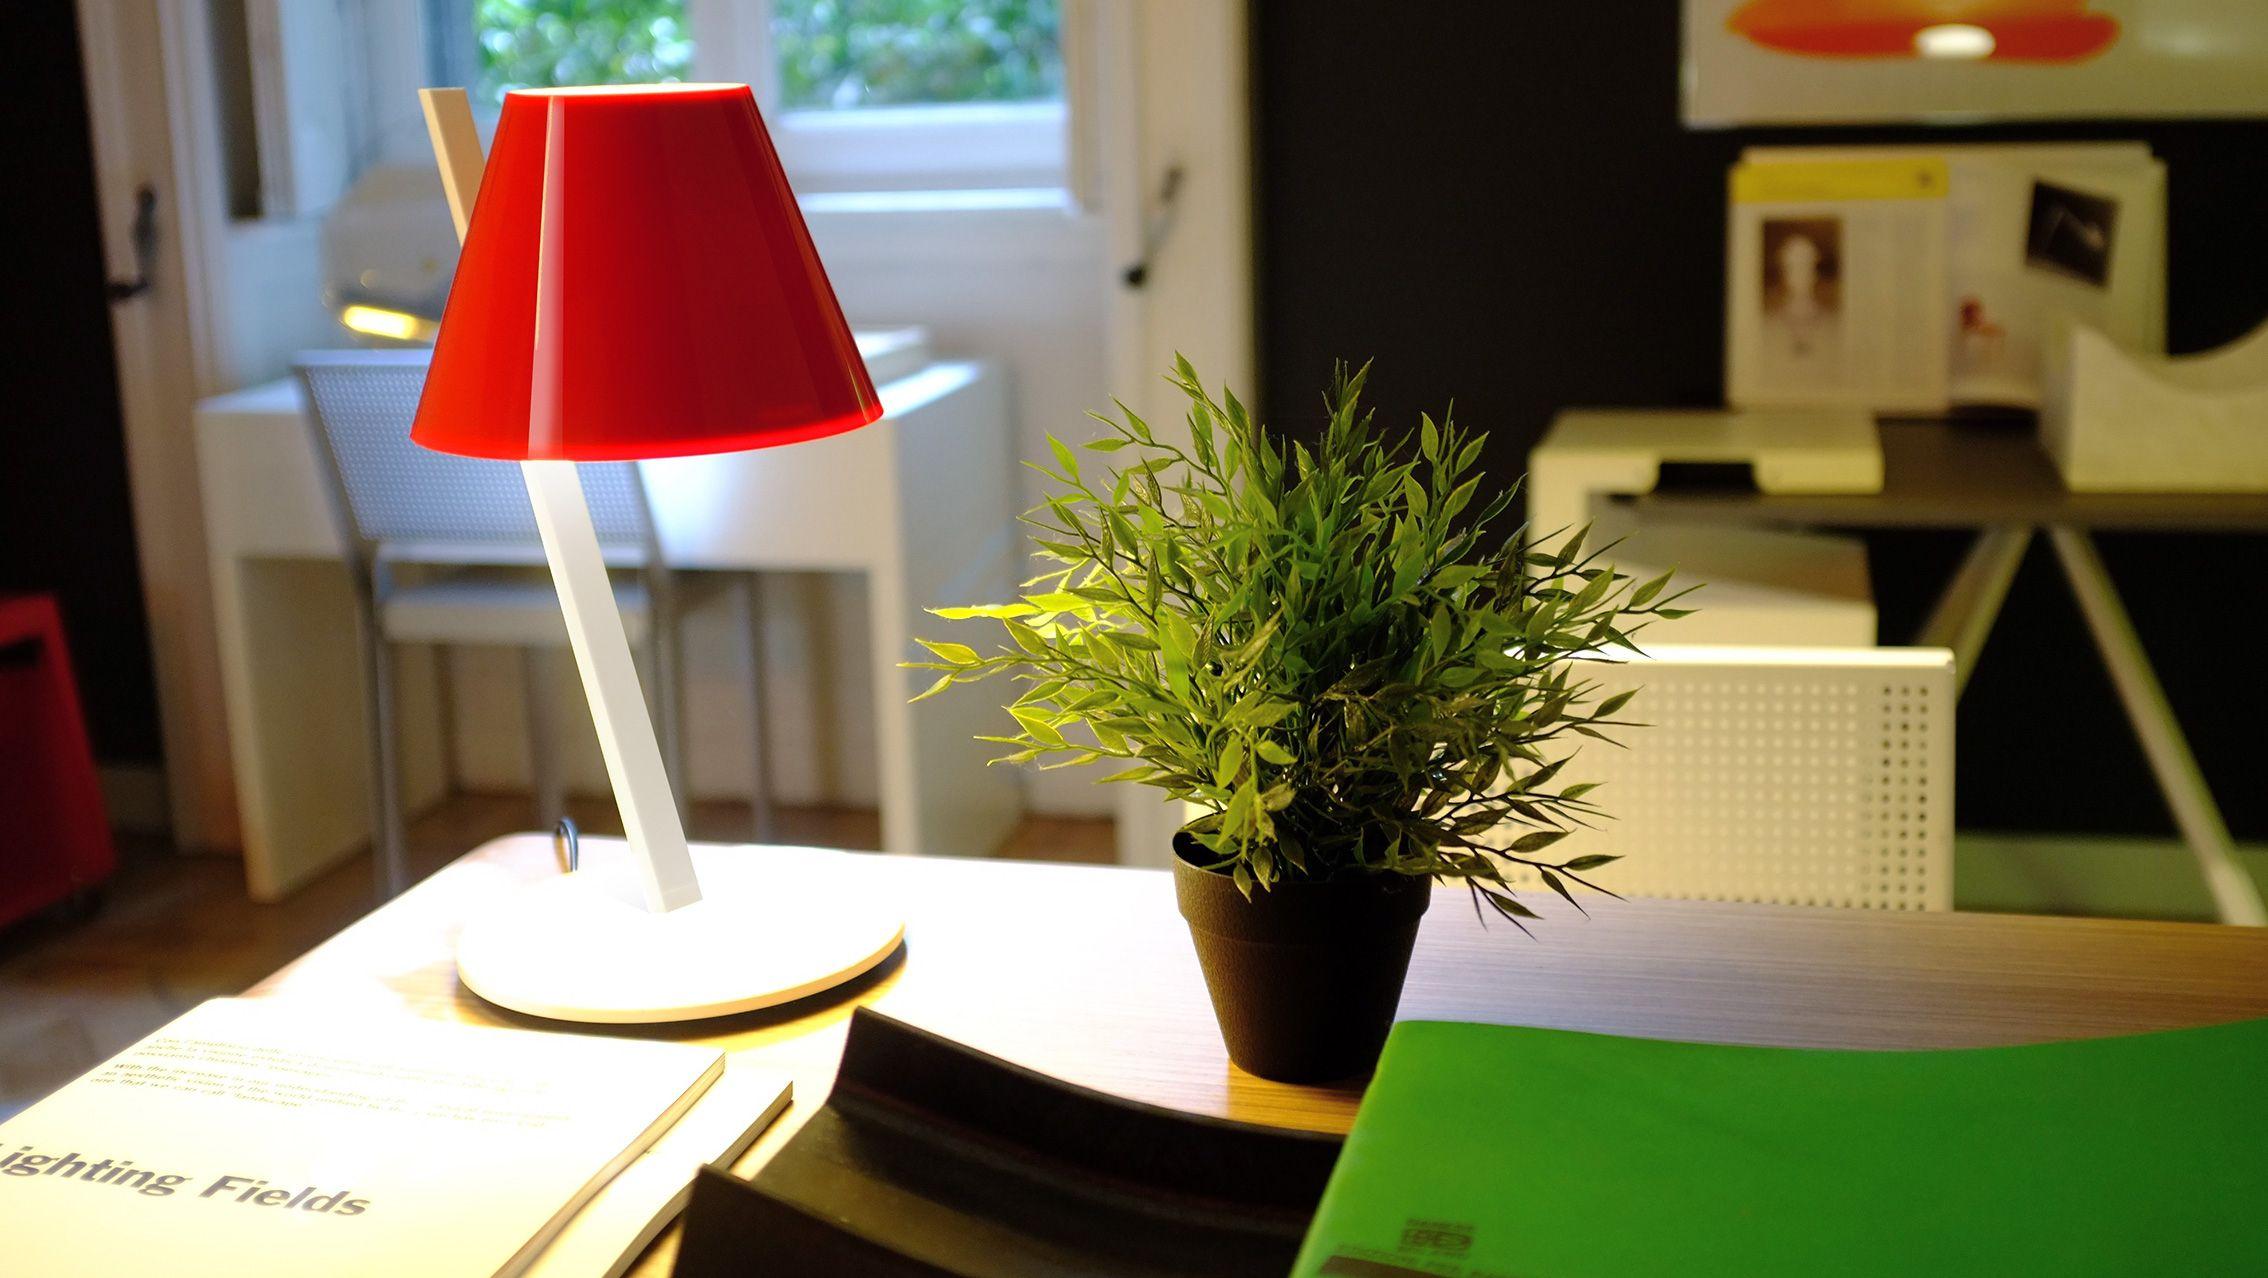 Lapetite Dresses Itself In Red And White To Delight Us Design Quaglio Simonelli Design Table Lamp Lamp Artemide